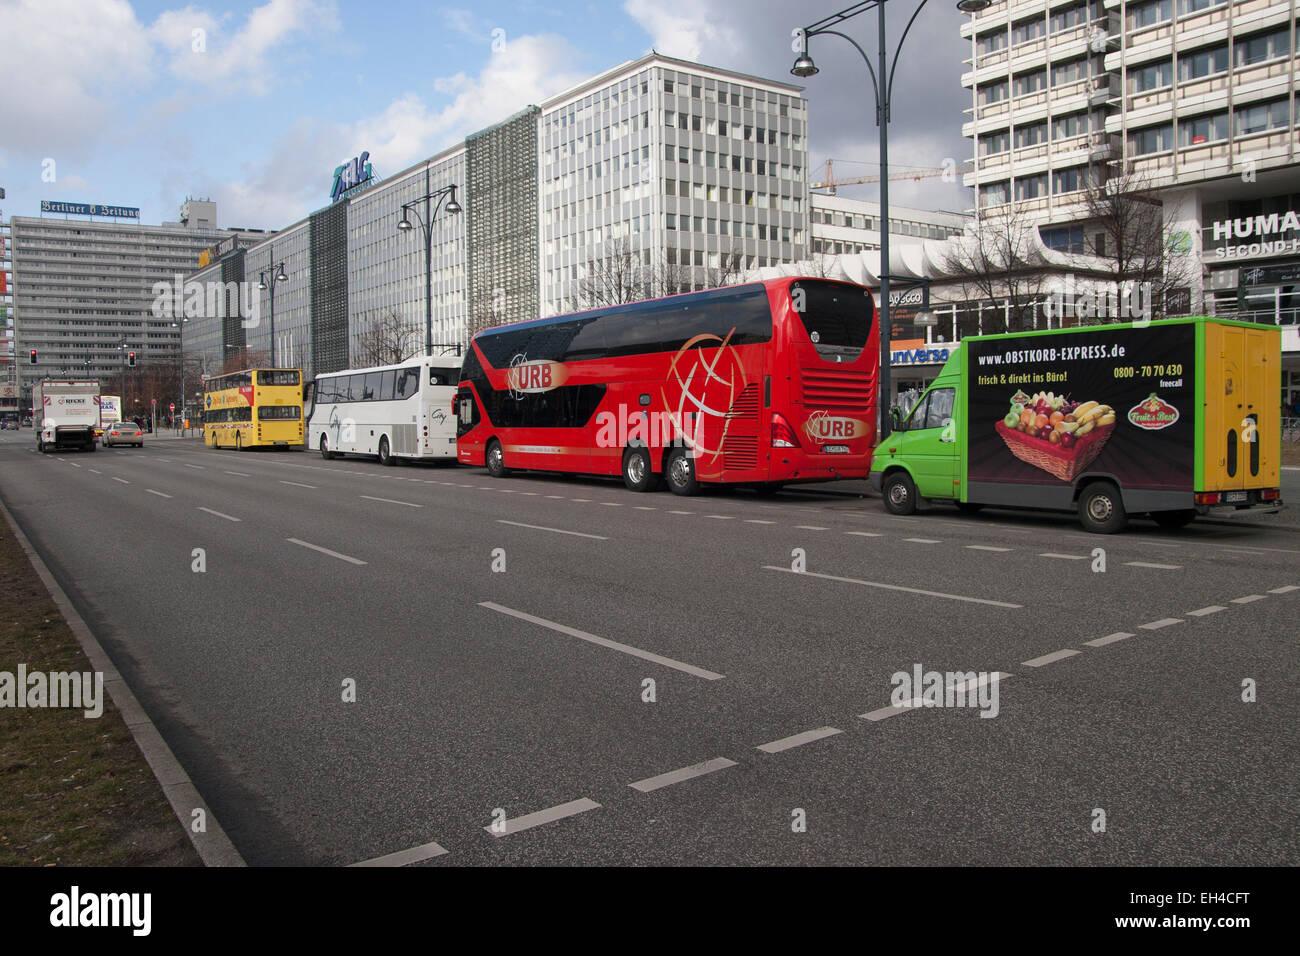 Street Parking Coaches Berlin Germany Stock Photo